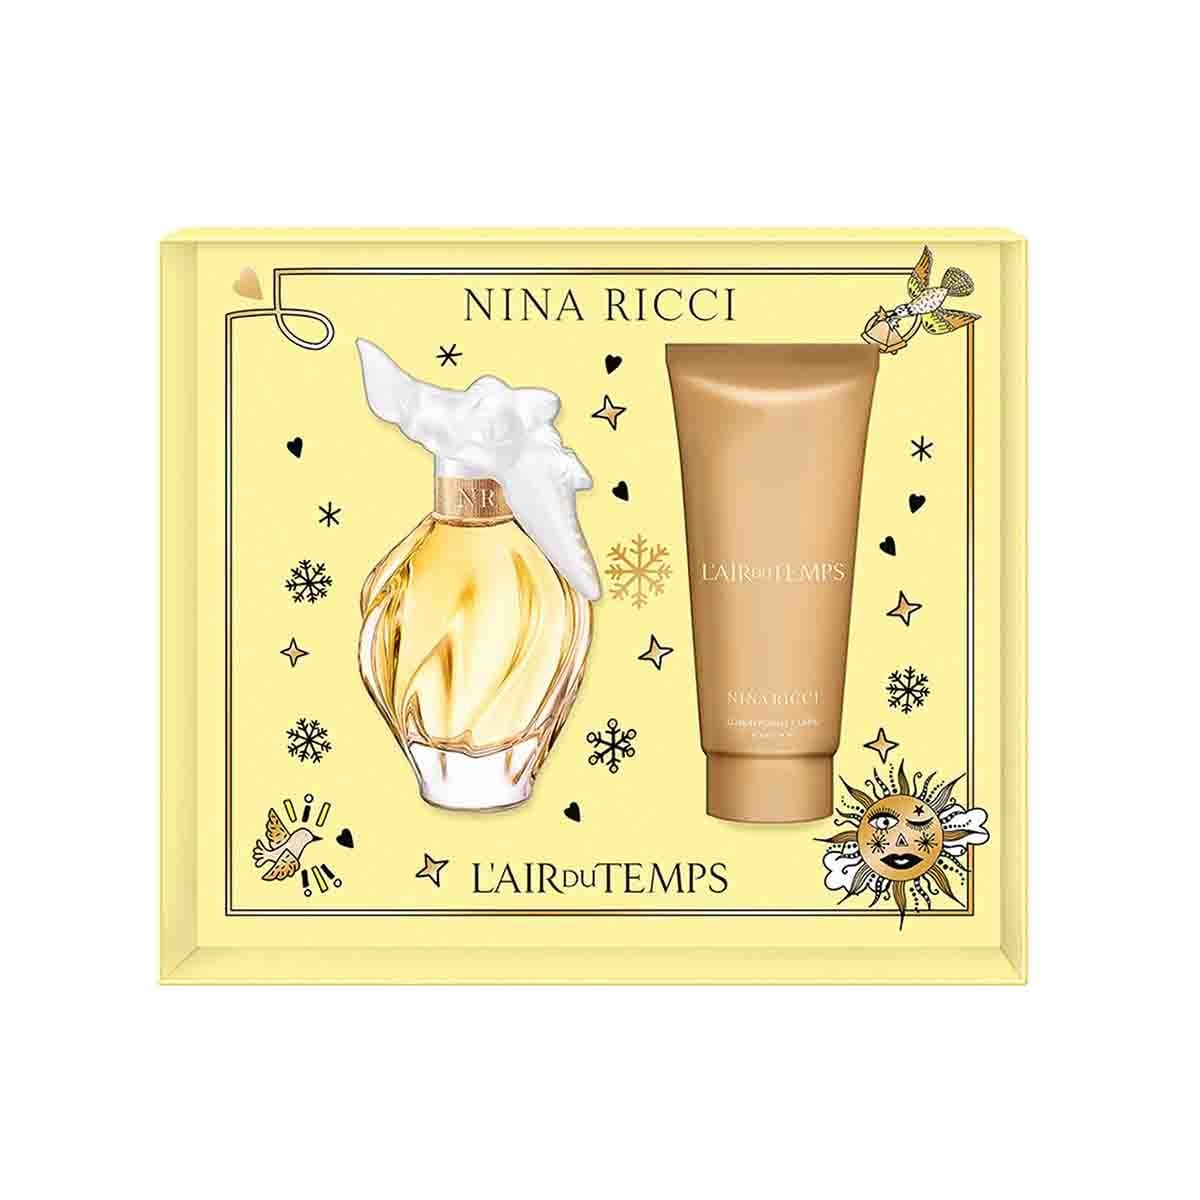 Estuche para Dama Nina Ricci Air Du Temps Edt 100 Ml + Body Lotion 100 Ml